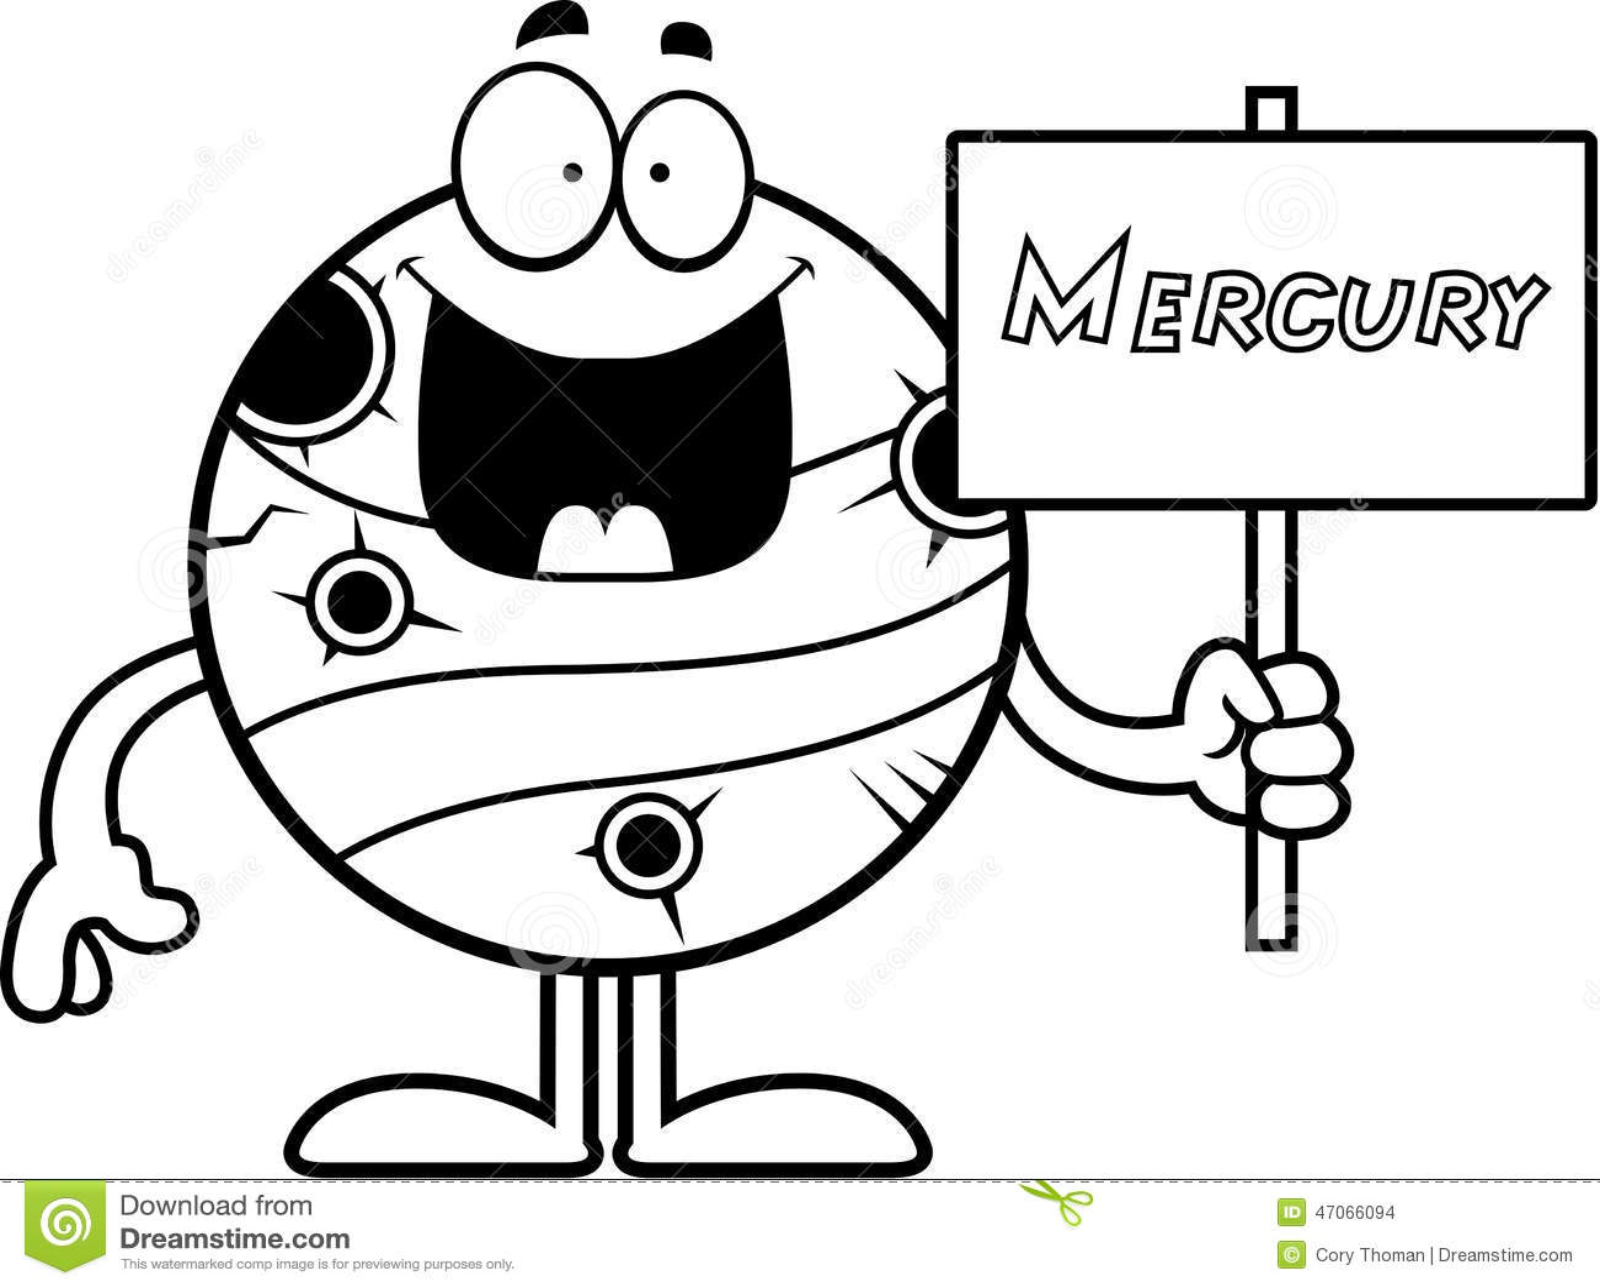 Cartoon Mercury Sign stock vector. Illustration of graphic